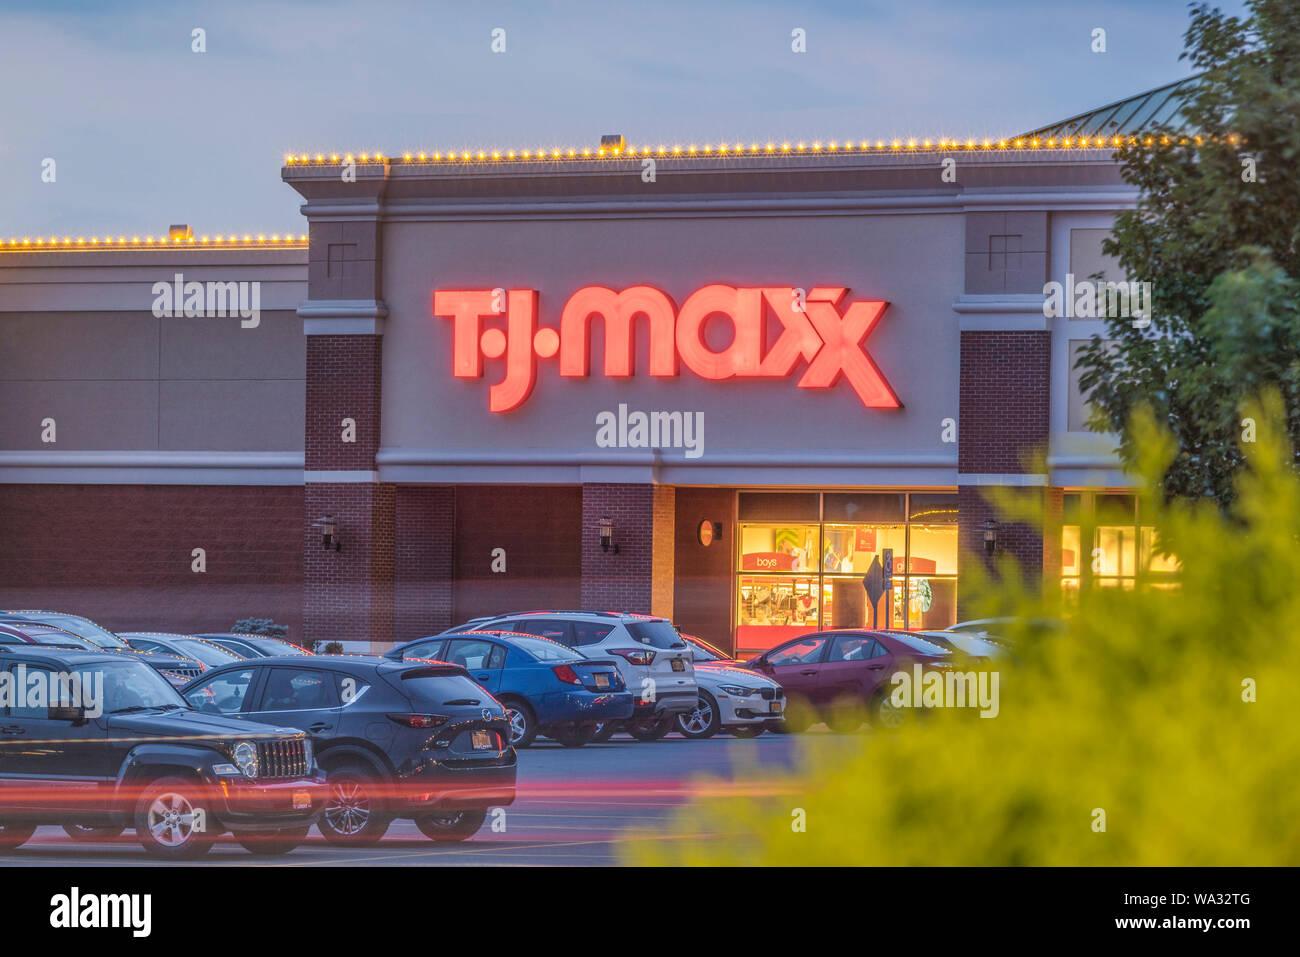 Tj Maxx Store Stock Photos & Tj Maxx Store Stock Images - Alamy